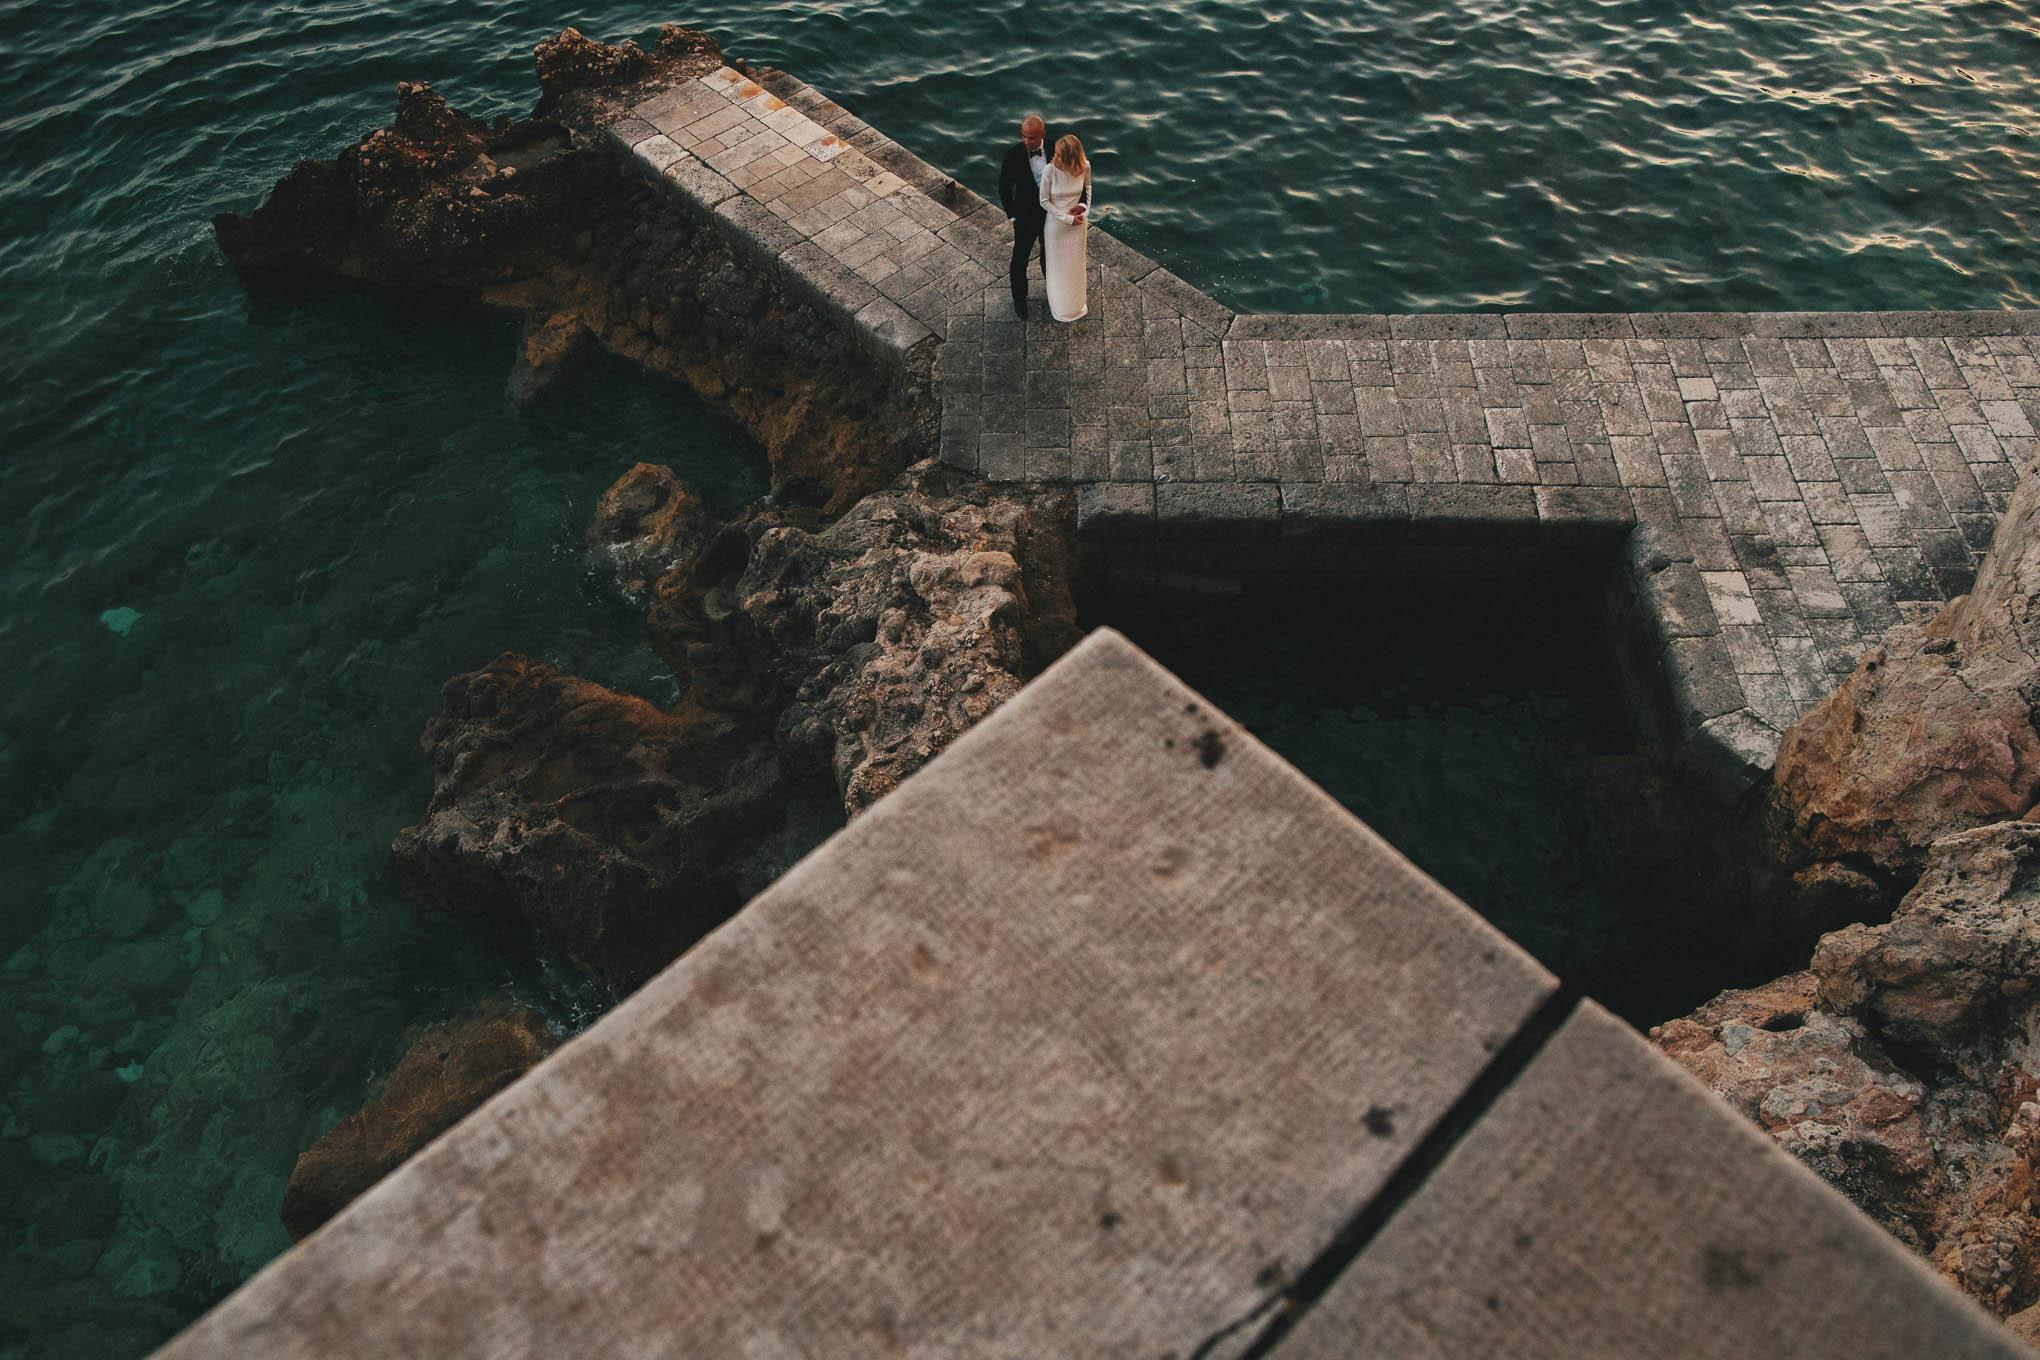 Categories: Weddings-Real Wedding: Nina+Nico - Photography by Tim Kelly and Nadine Ellen